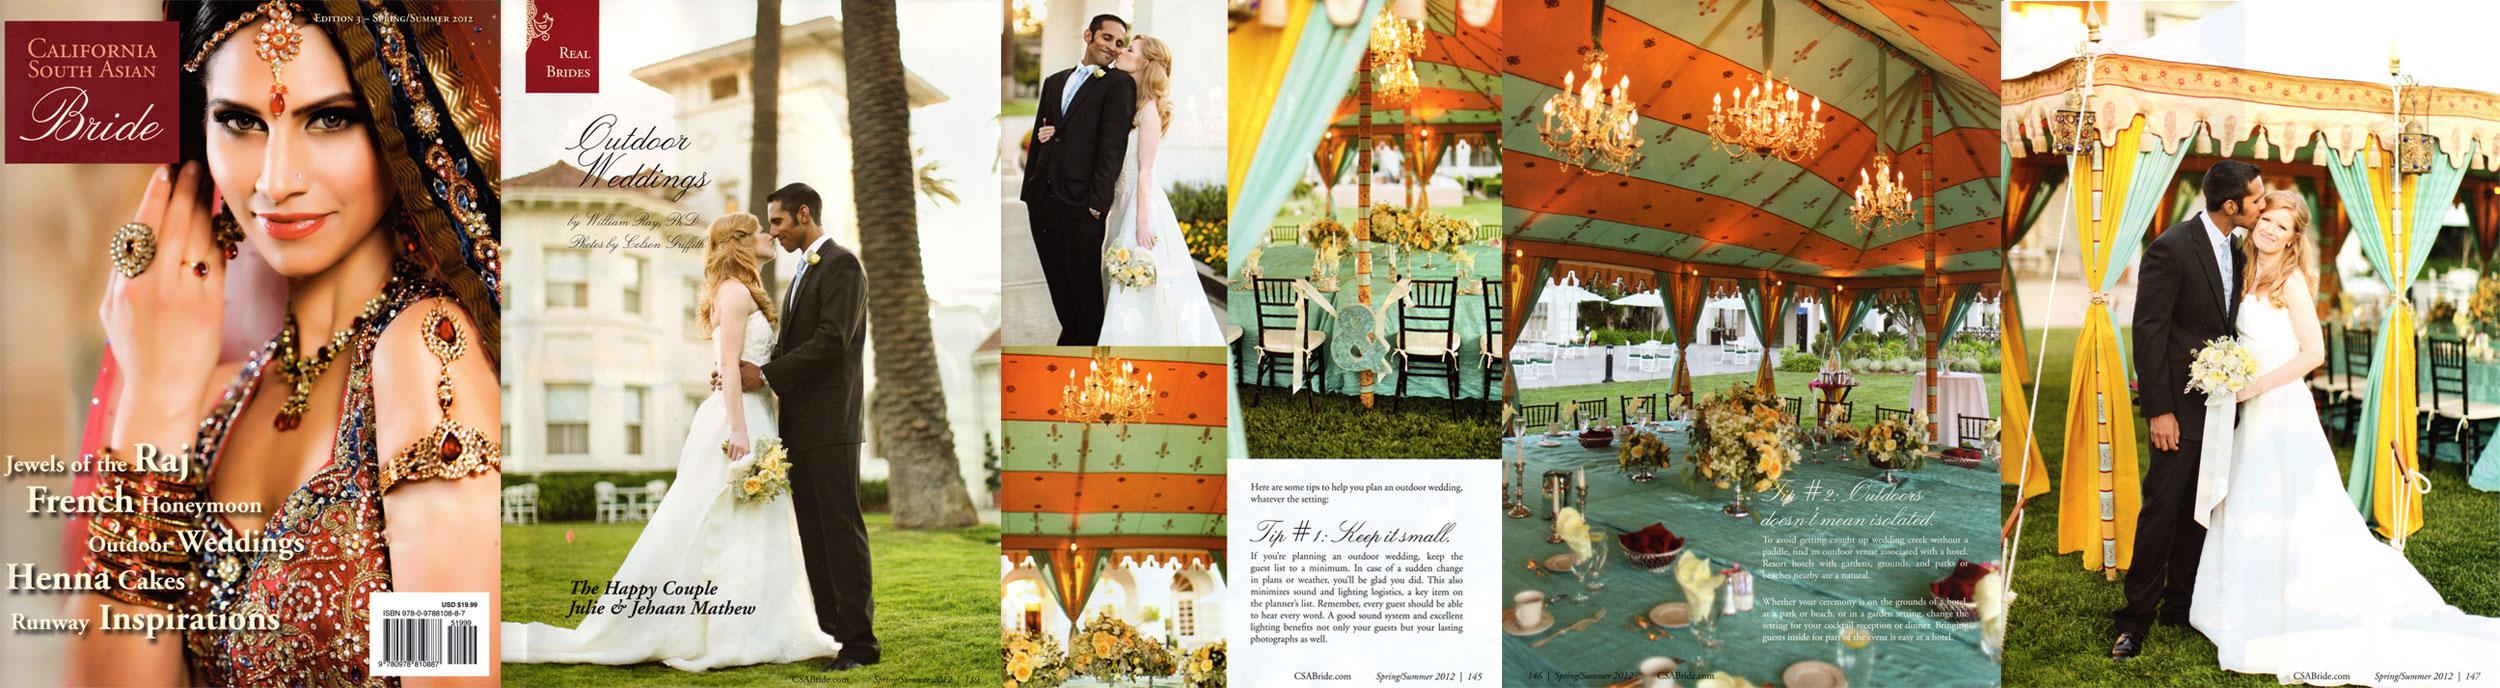 raj-tents-california-south-asian-bride-magazine-2012-real-wedding.jpg